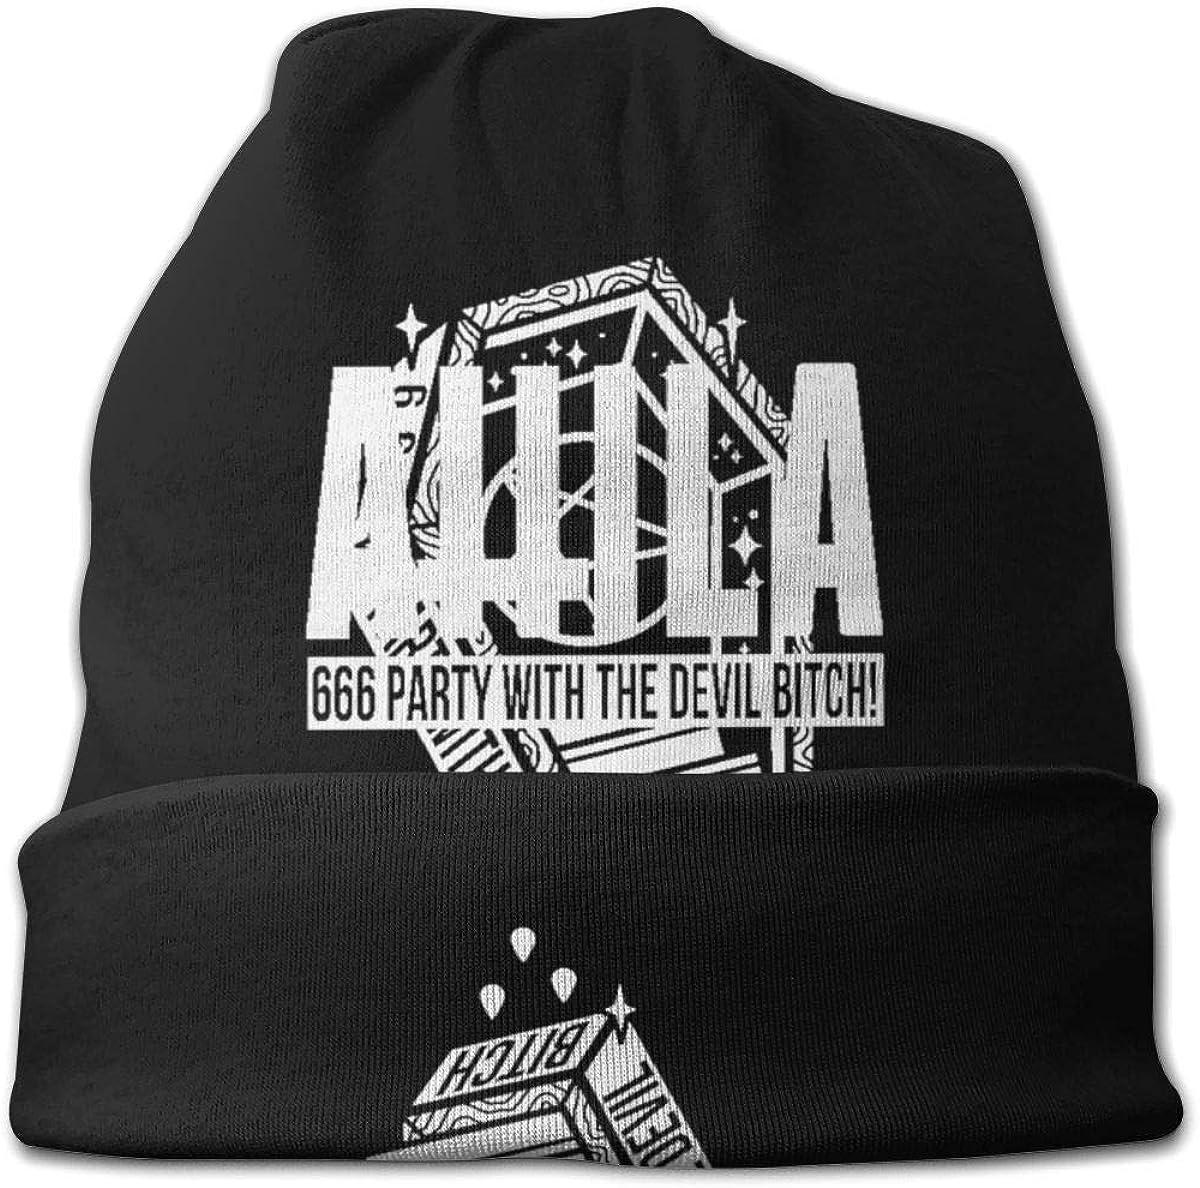 JDHFJ Kid s Attila Coffin Beanie Hat Novit/à Warm Skull Knit Hat Slouchy Soft Headwear Cuffed Cap Black